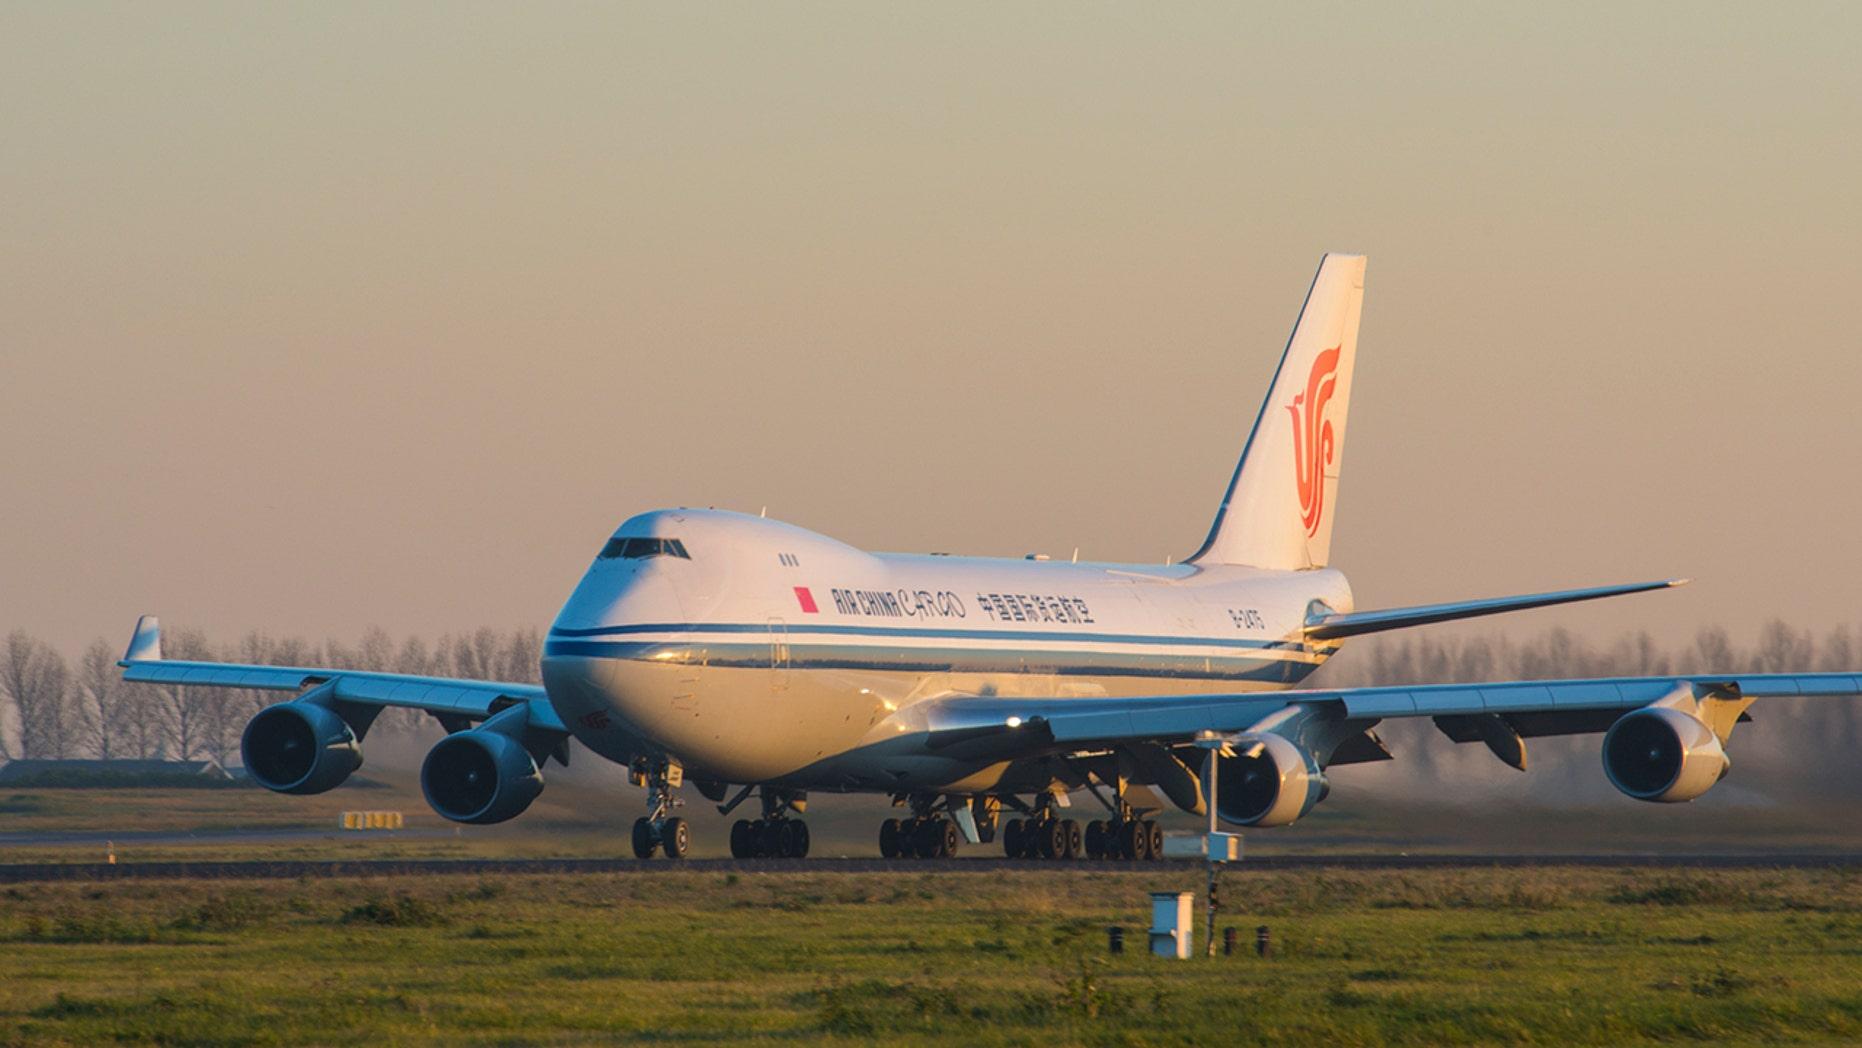 Air China Flight 1350 (not pictured) was rerouted to Zhengzhou, where authorities were waiting.